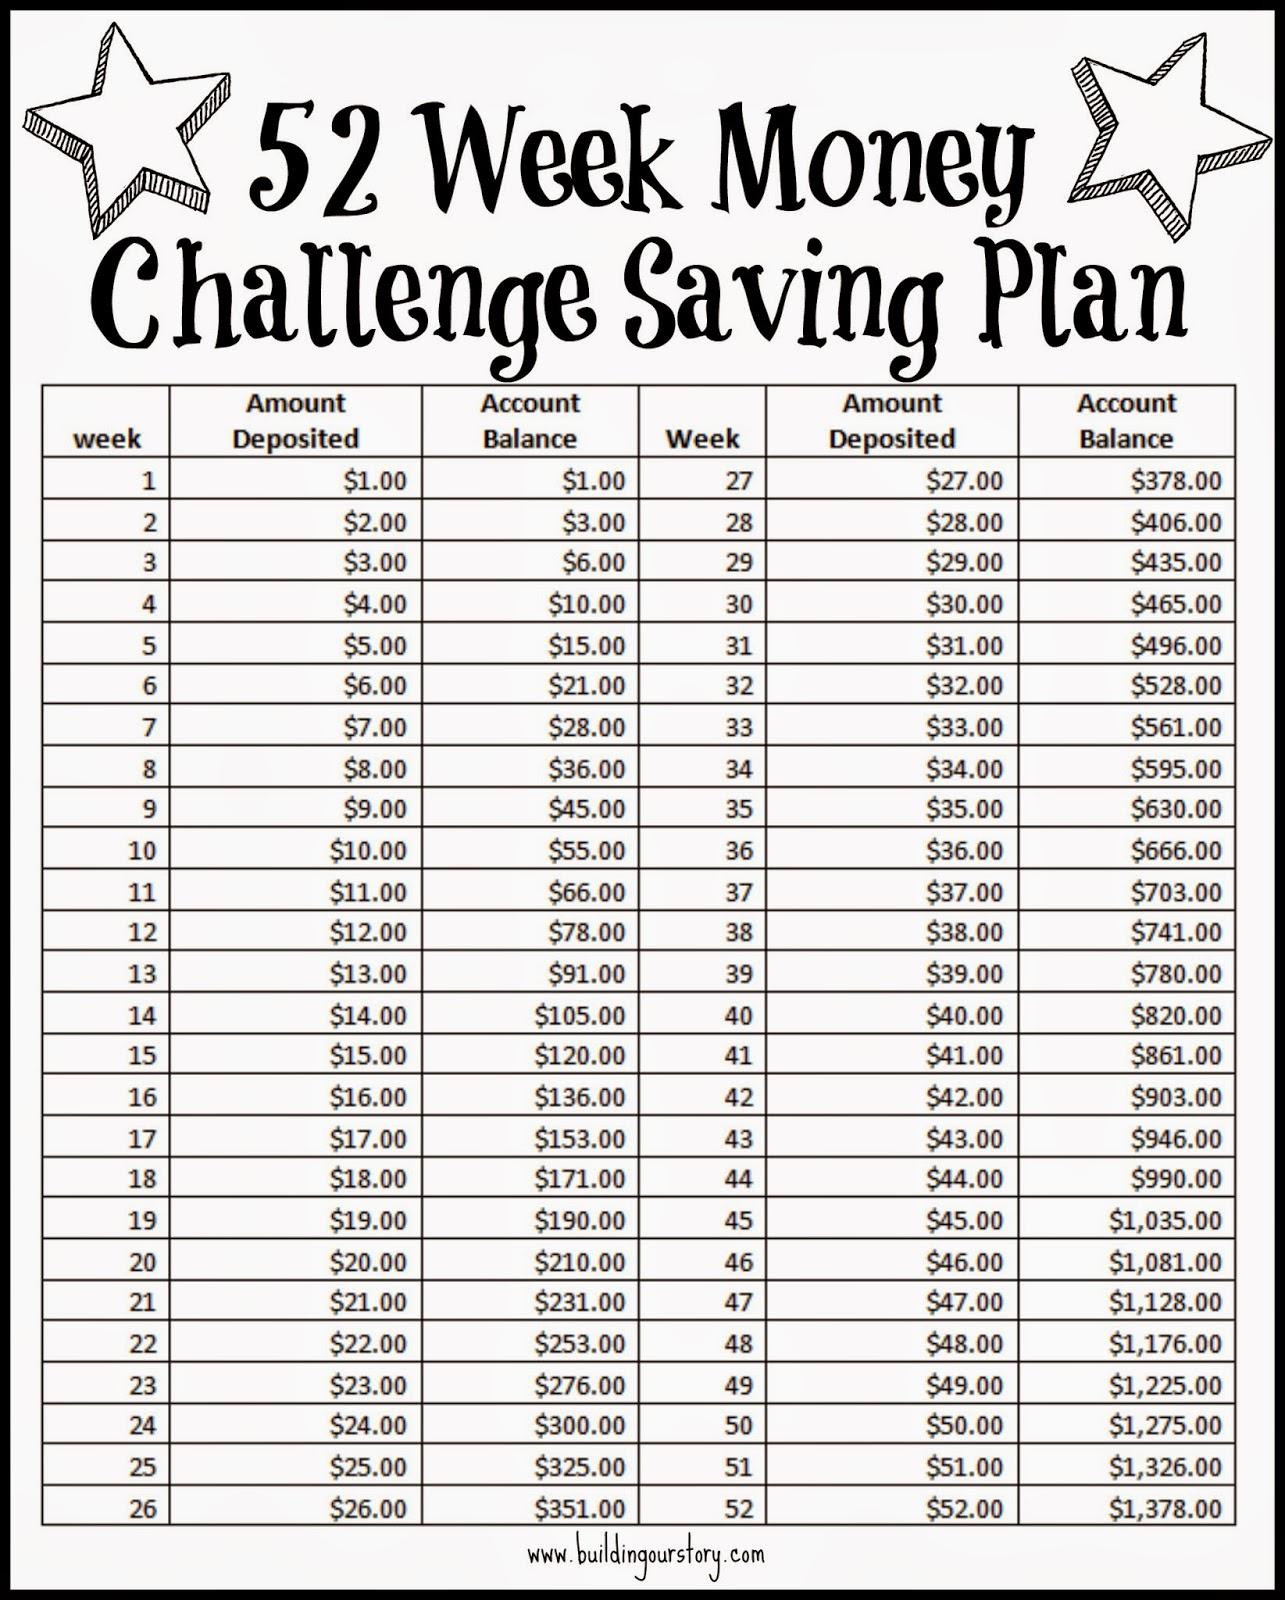 ... Journey.: Let's start 2016 with 52 Week Money Challenge Saving Plan